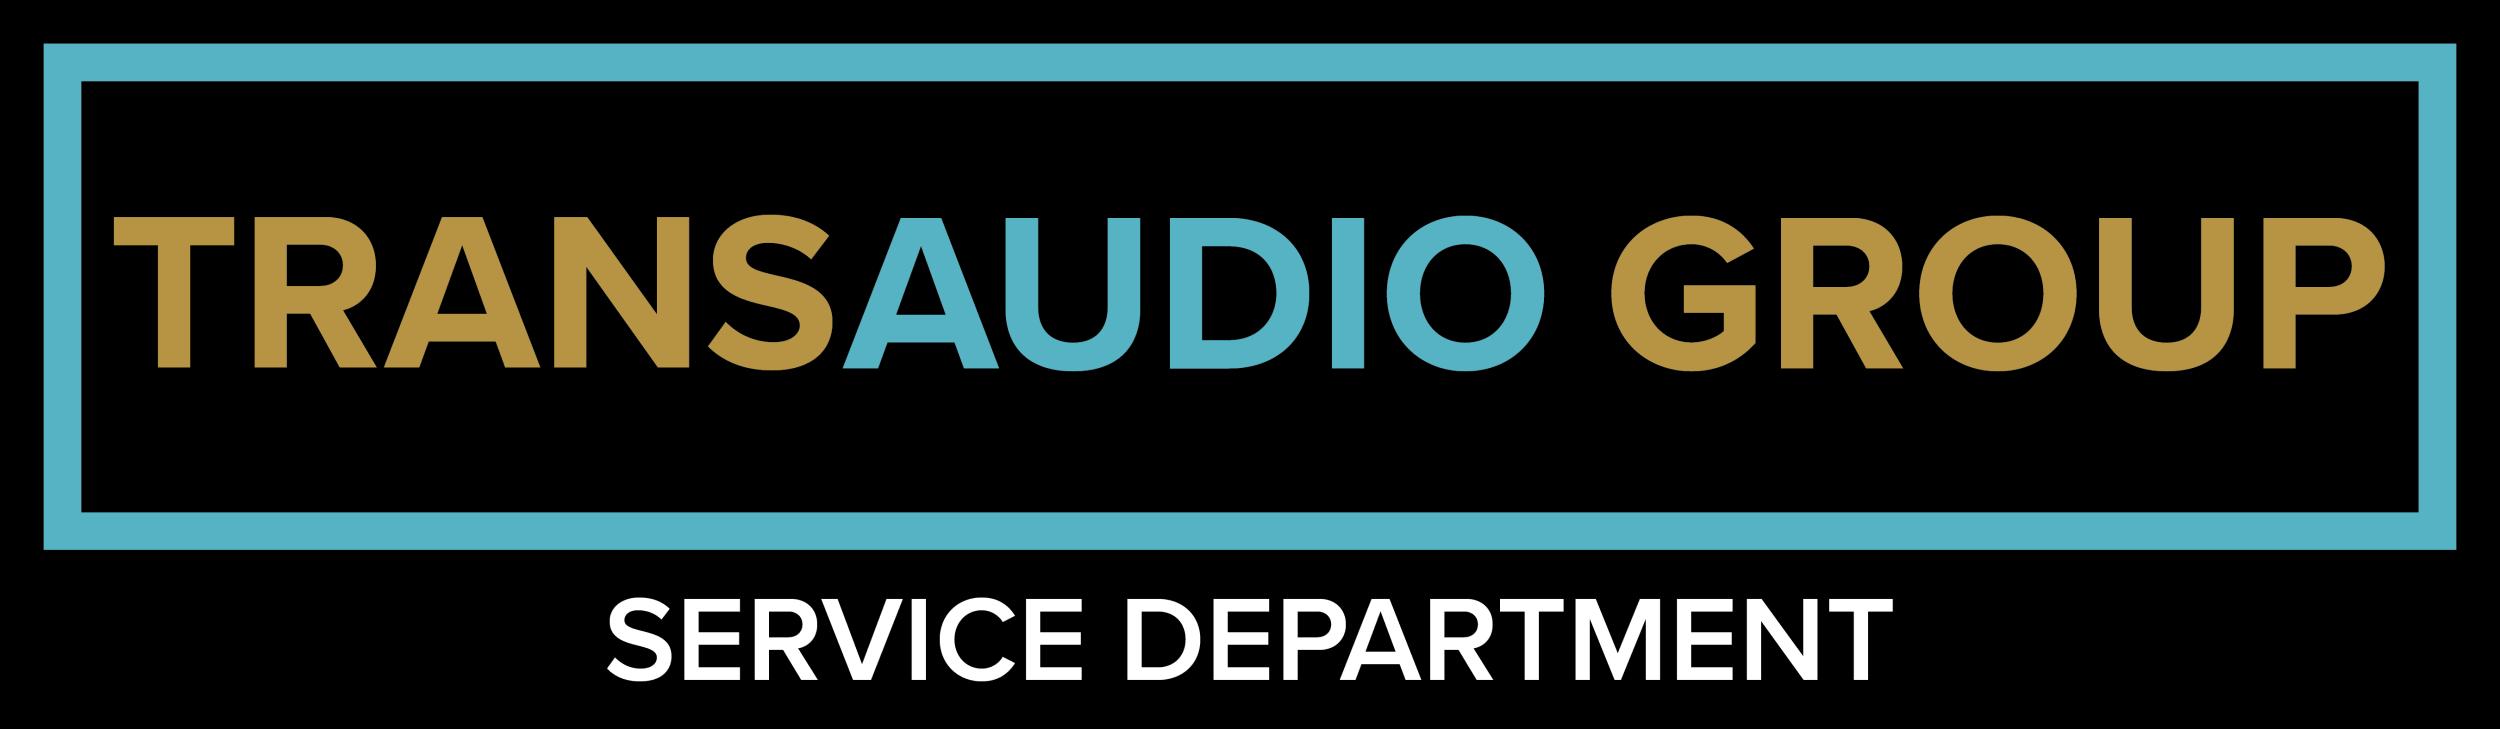 TransAudio Group Store